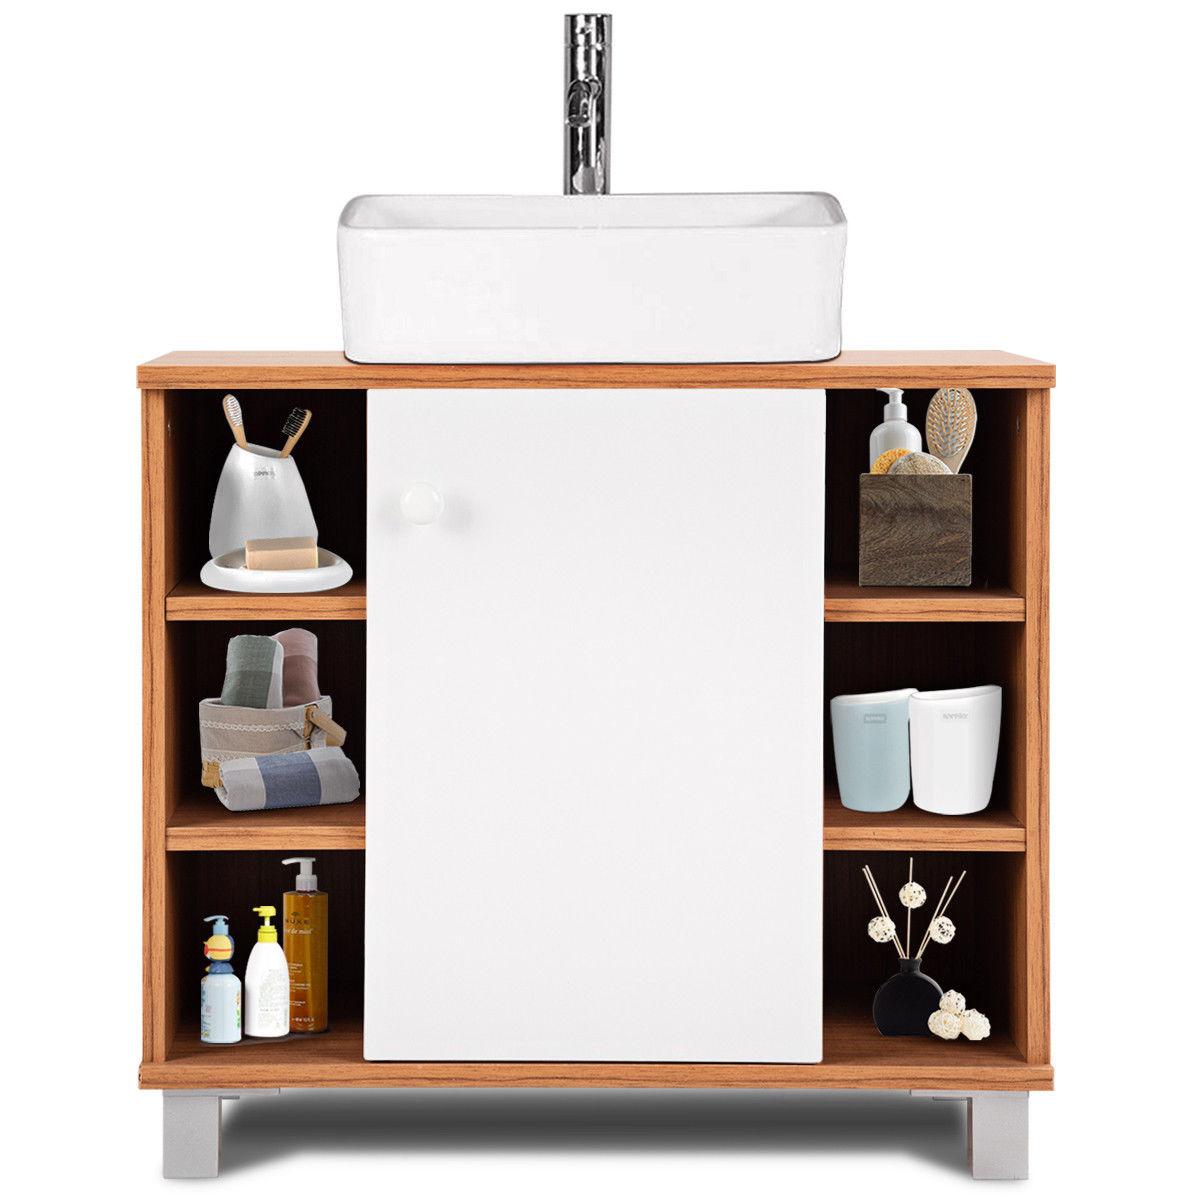 Costway Under Sink Cabinet Bathroom Spacesaver Storage Cabinet 6